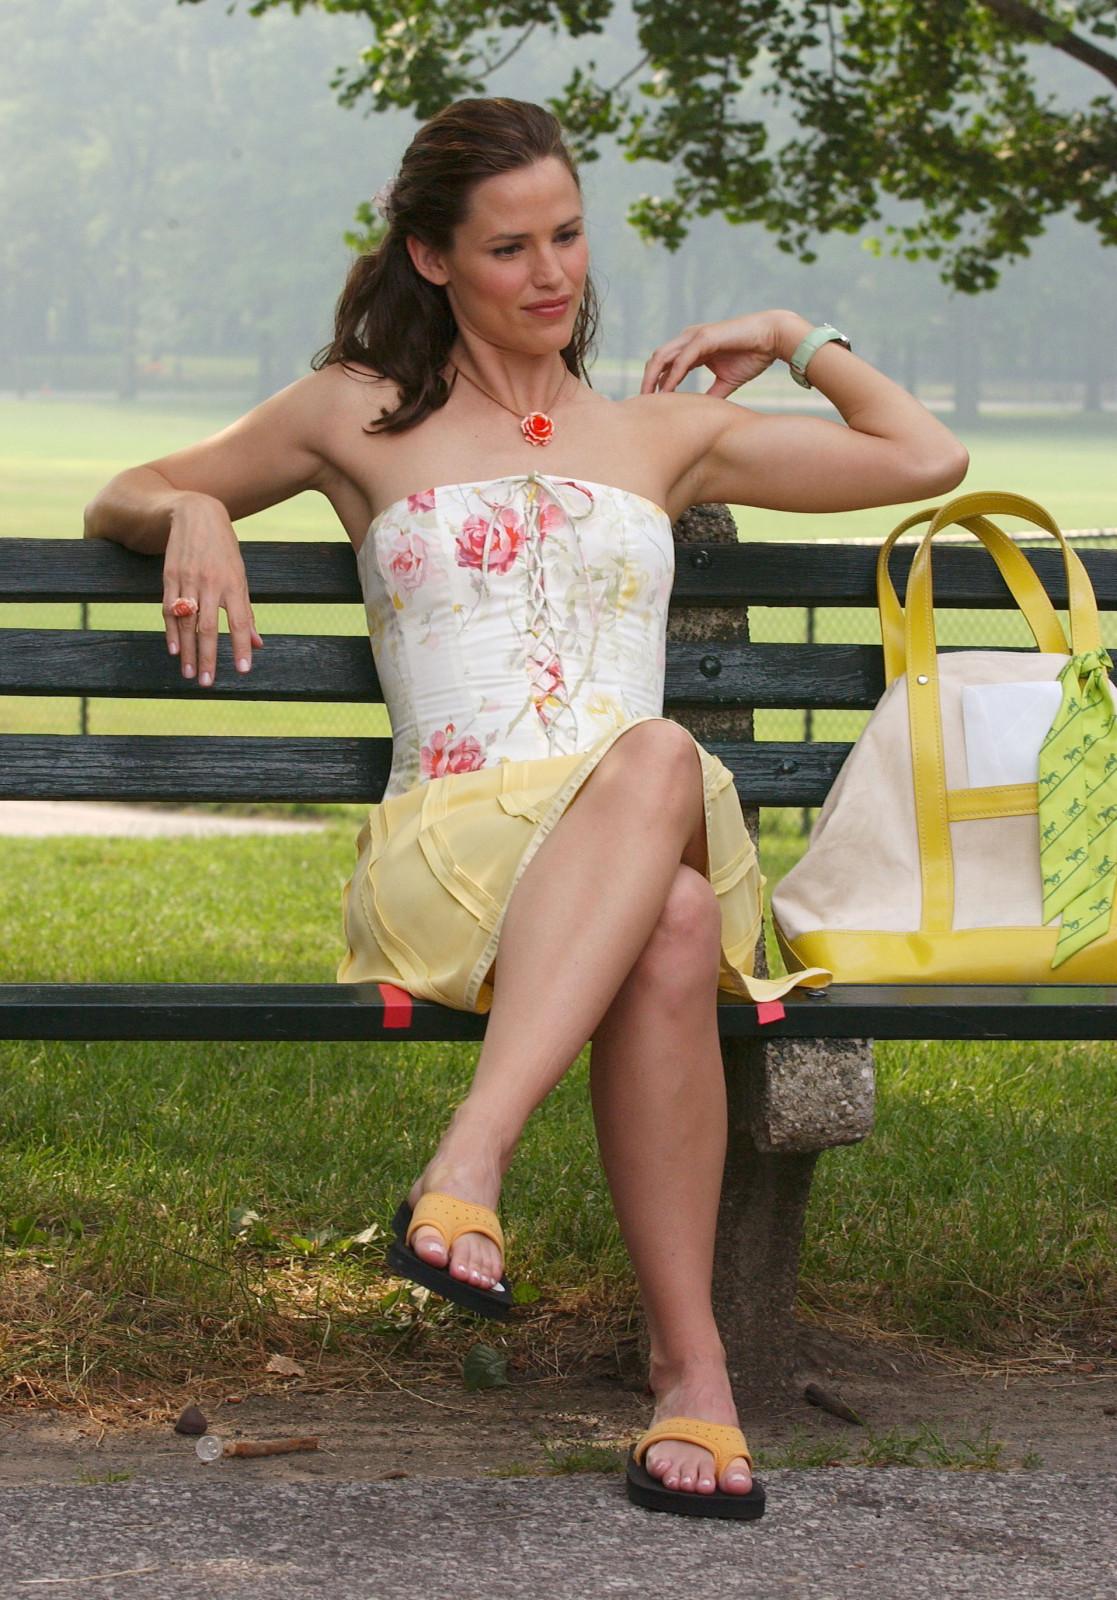 Jennifer-Garner-Feet-20726.jpg